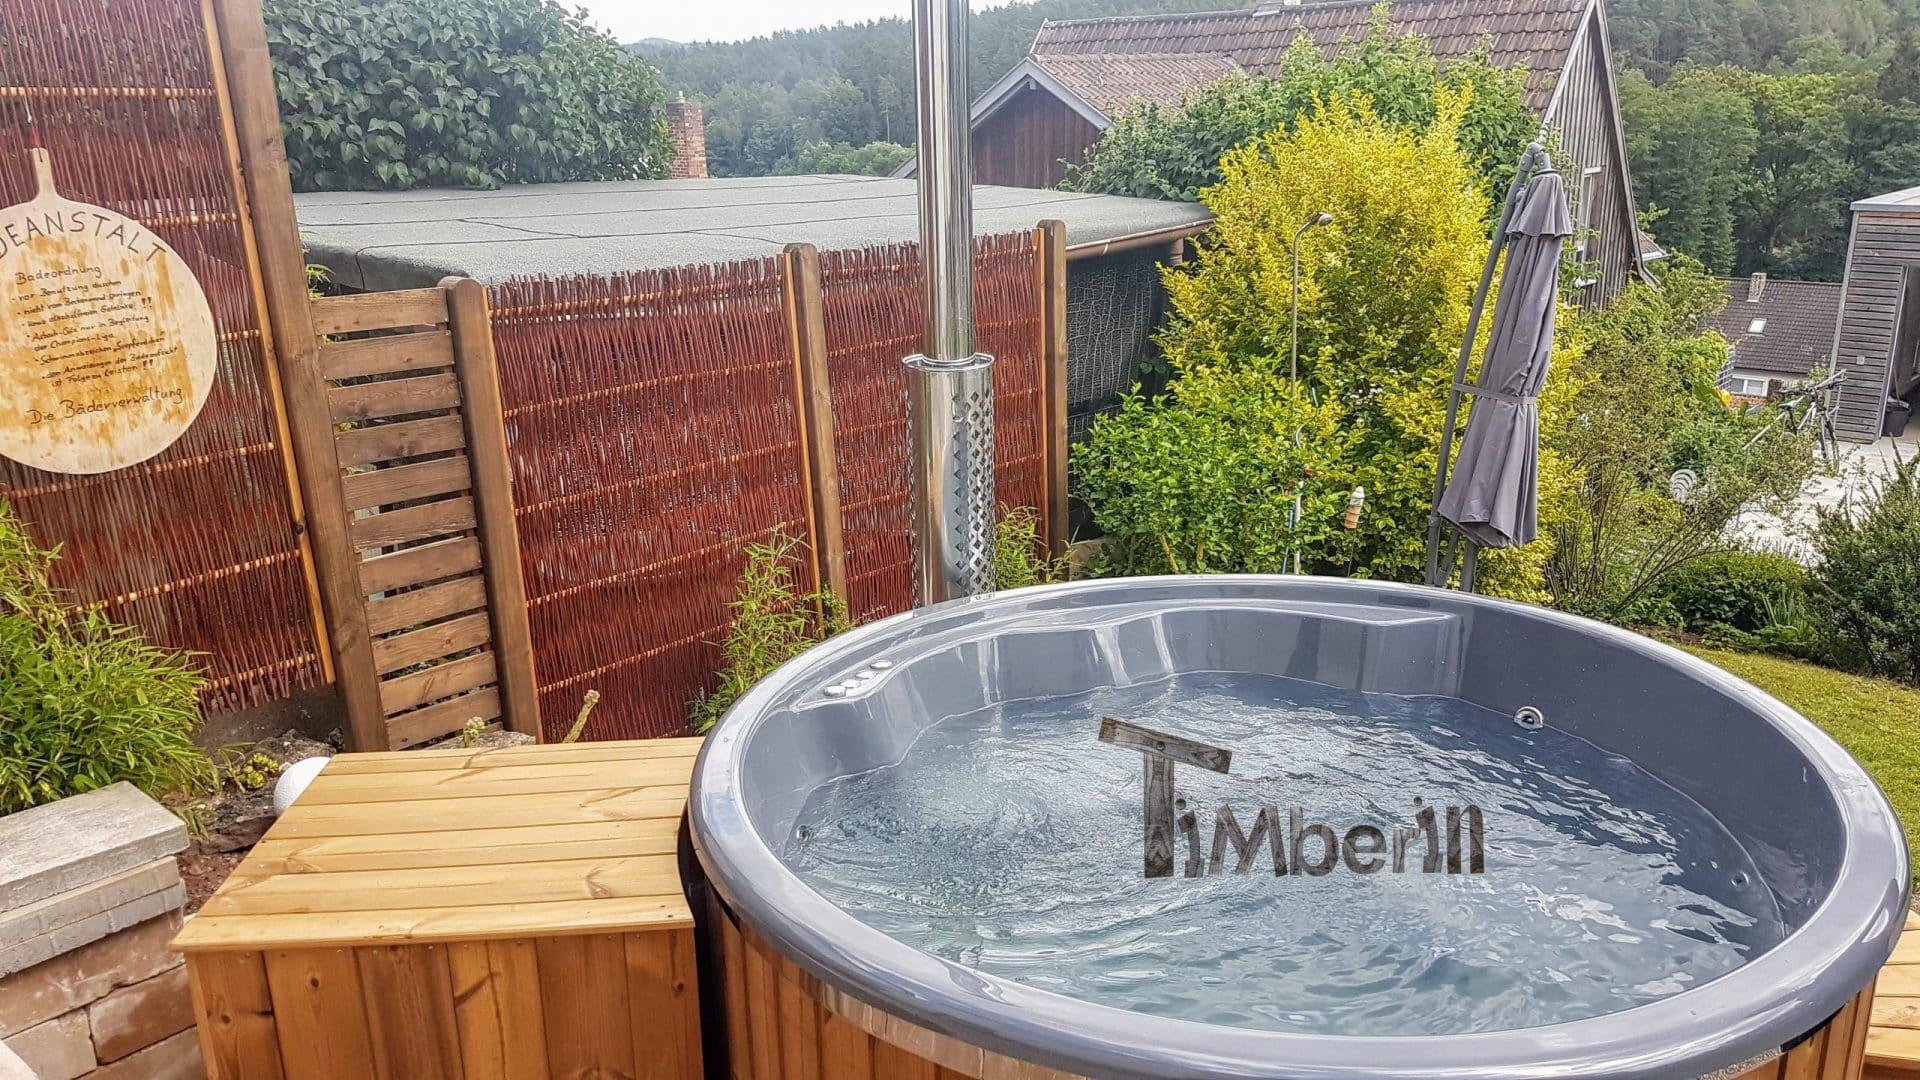 Badefass gfk mit Whirlpool Wellness Royal 2 7 scaled